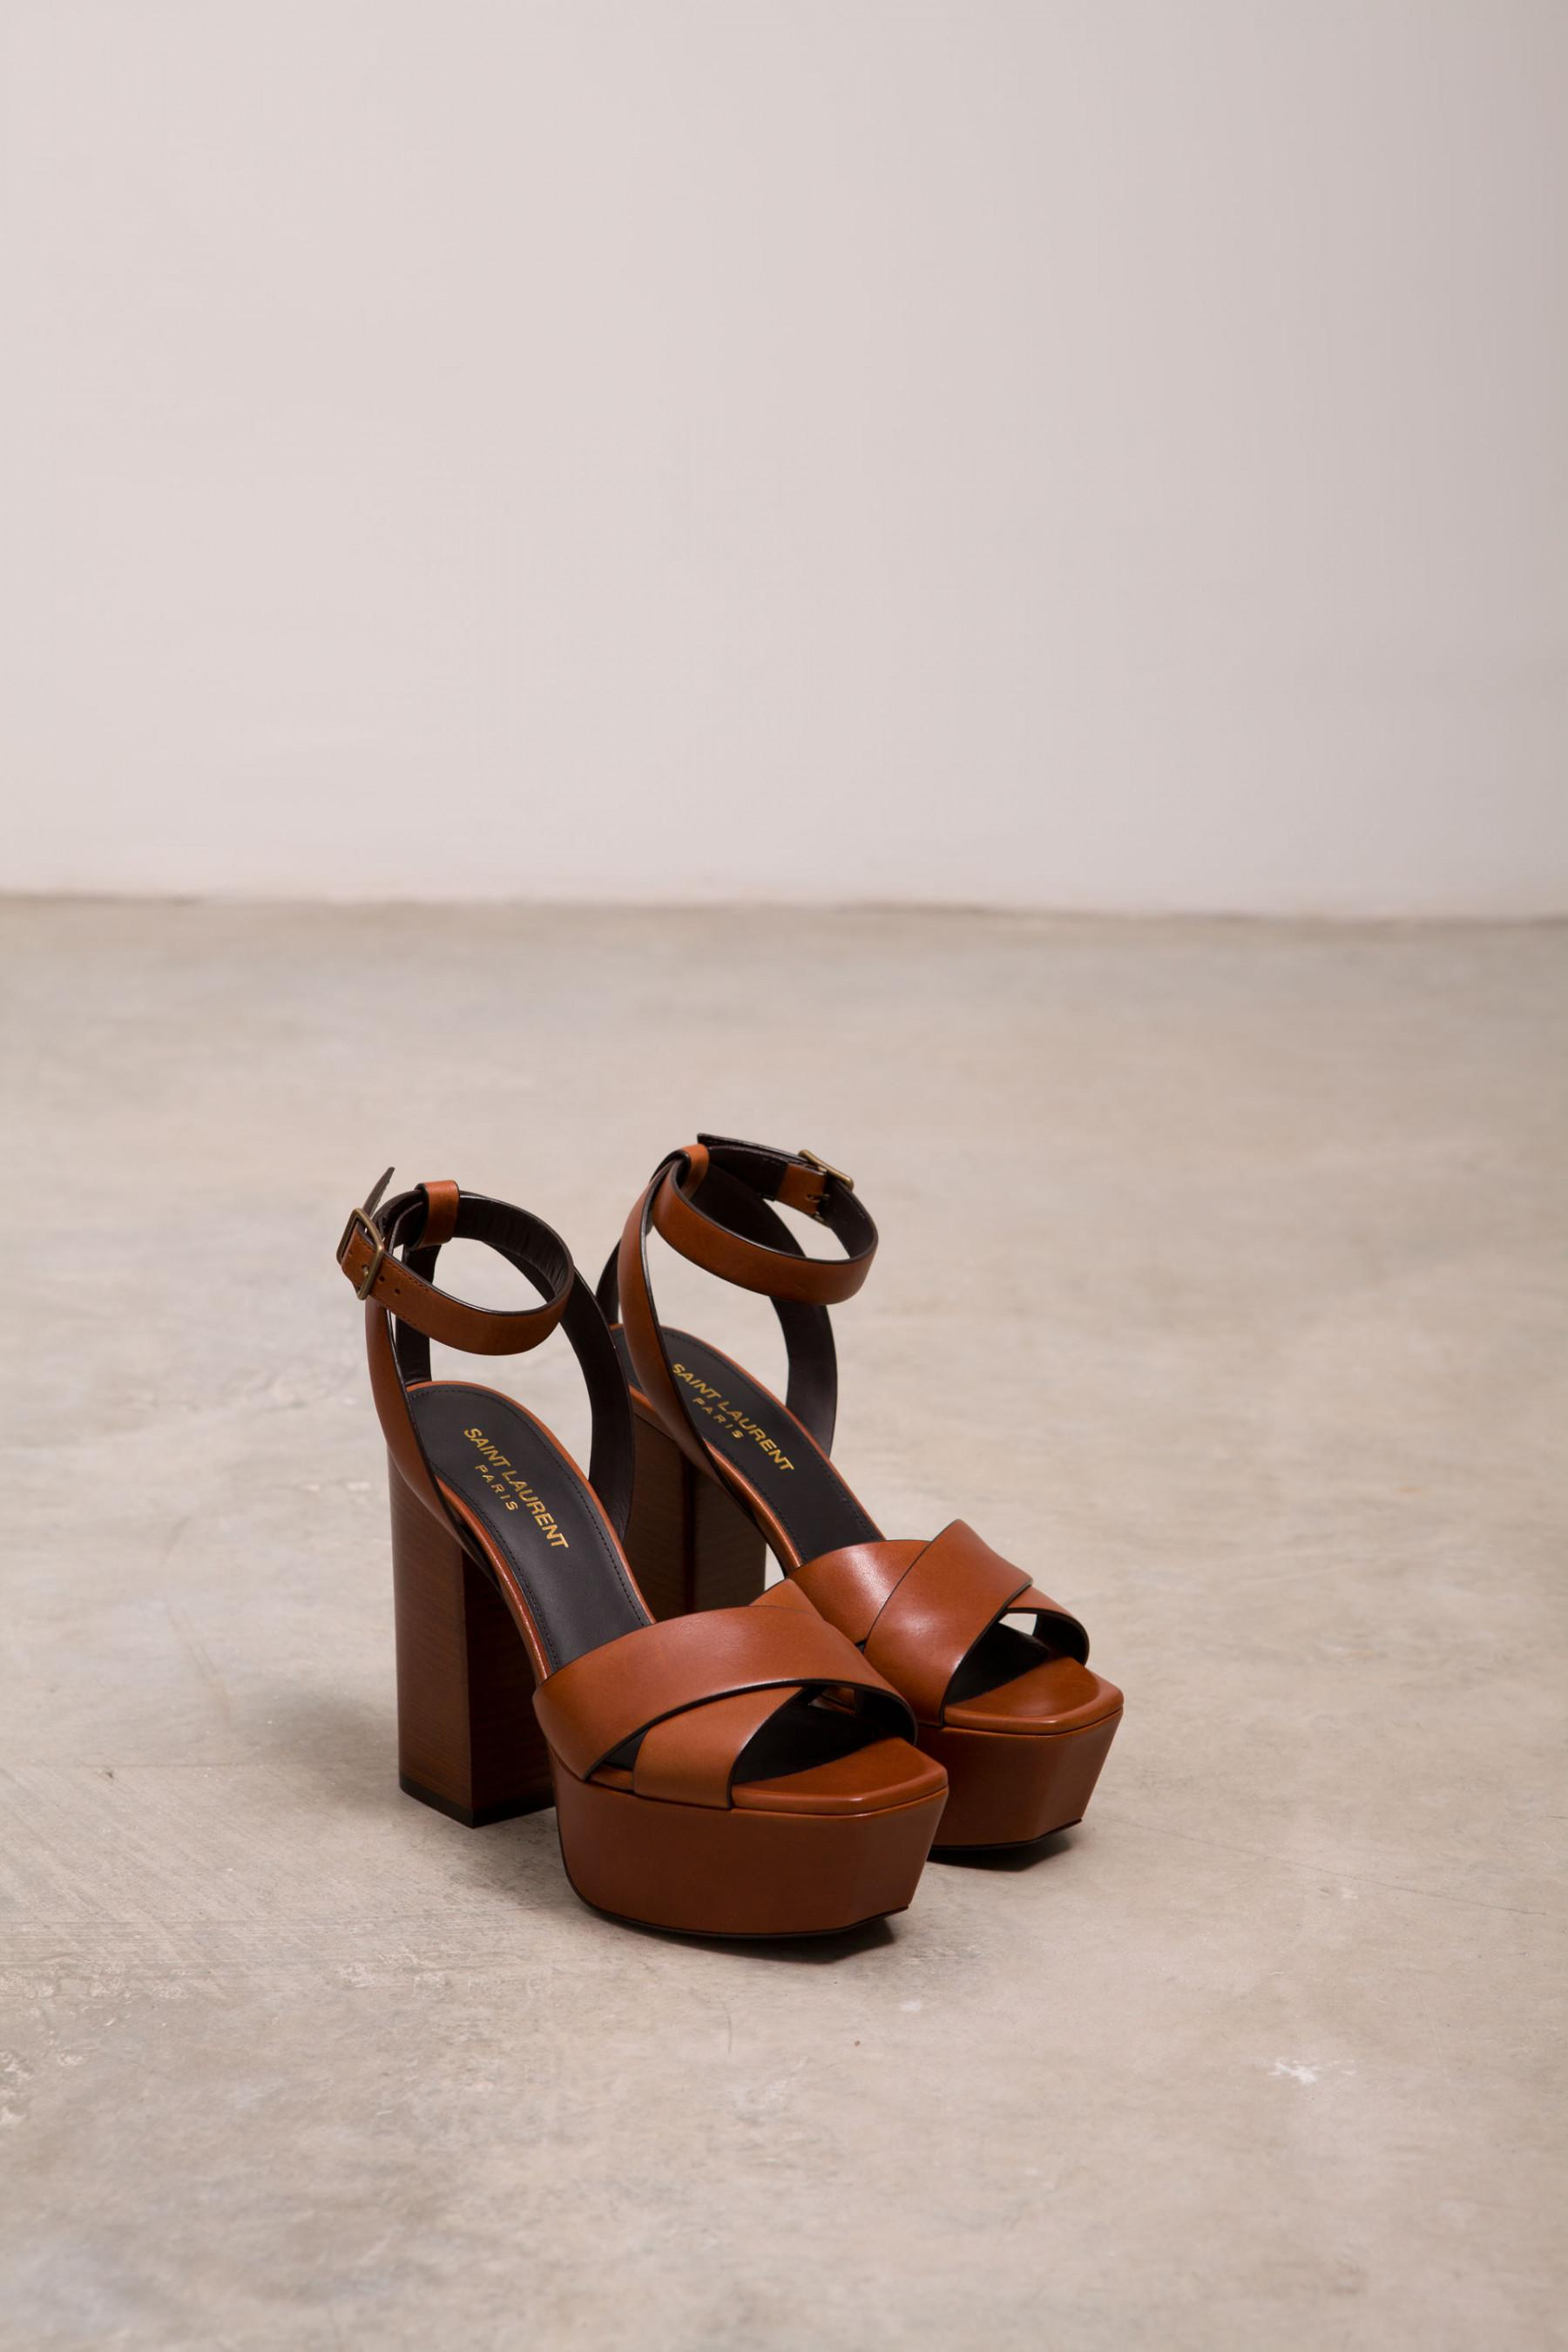 9c9b64aa488 Saint Laurent Farrah Platform Sandals in Orange - Lyst